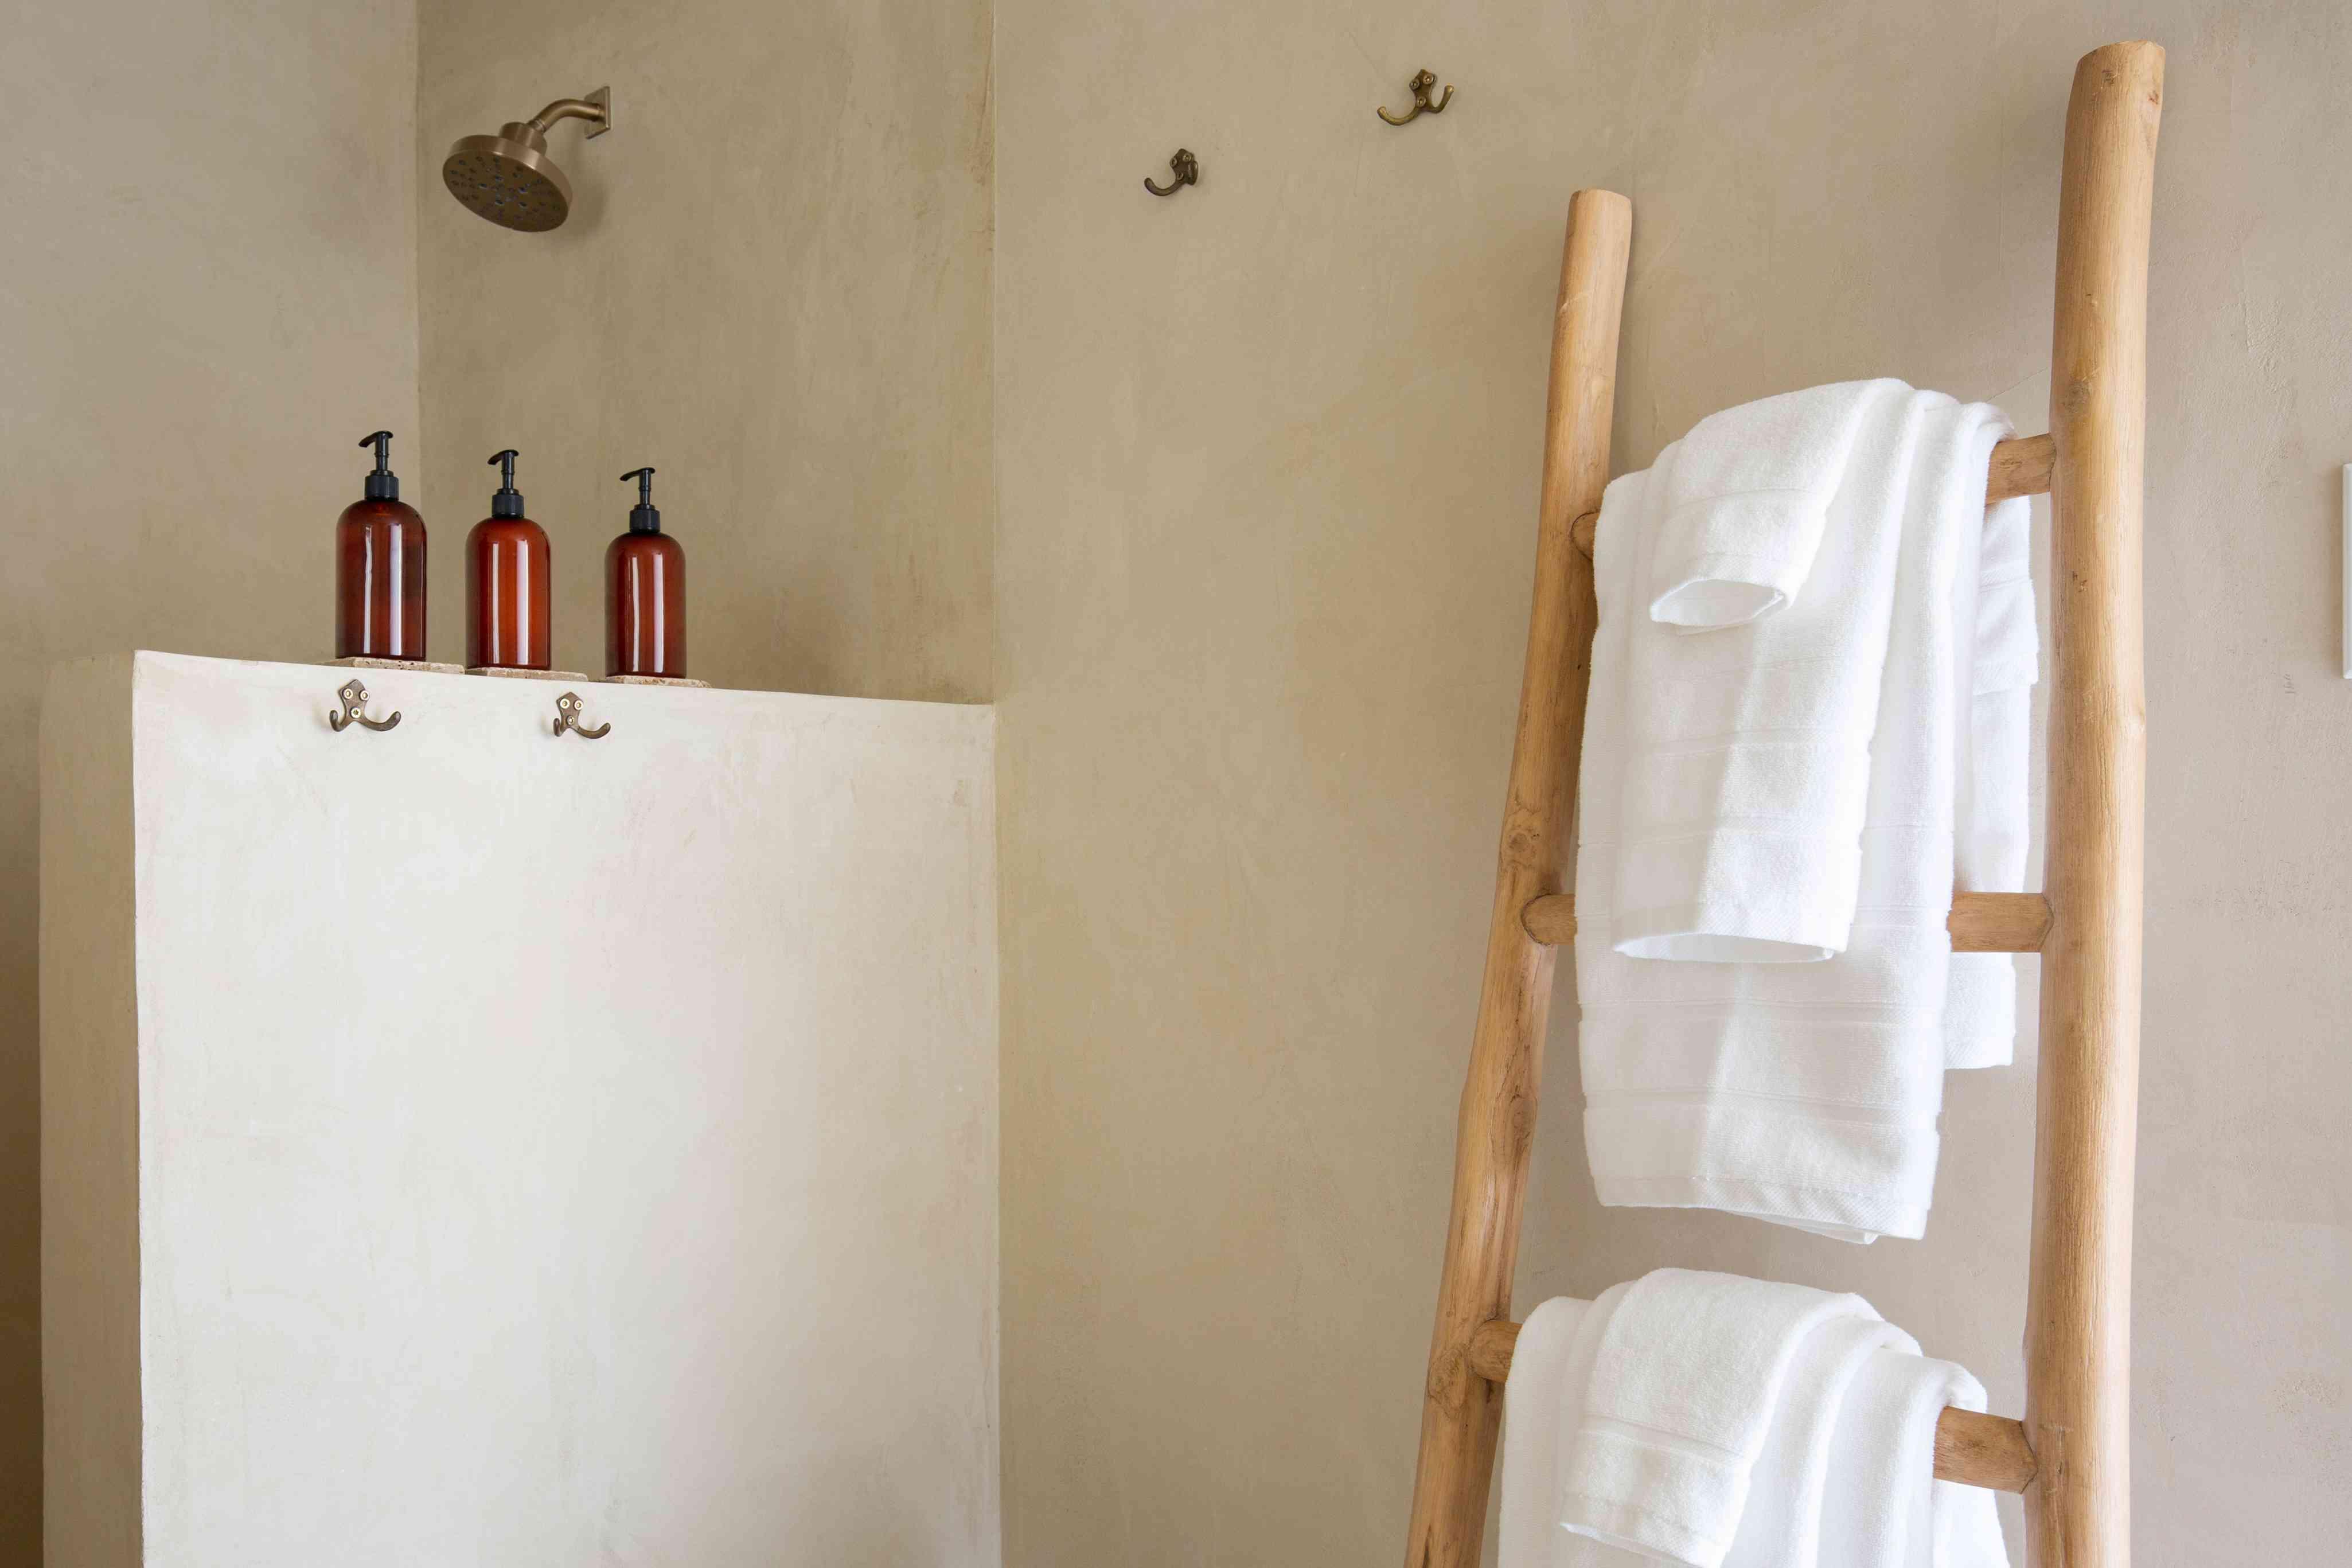 ladder holding towels